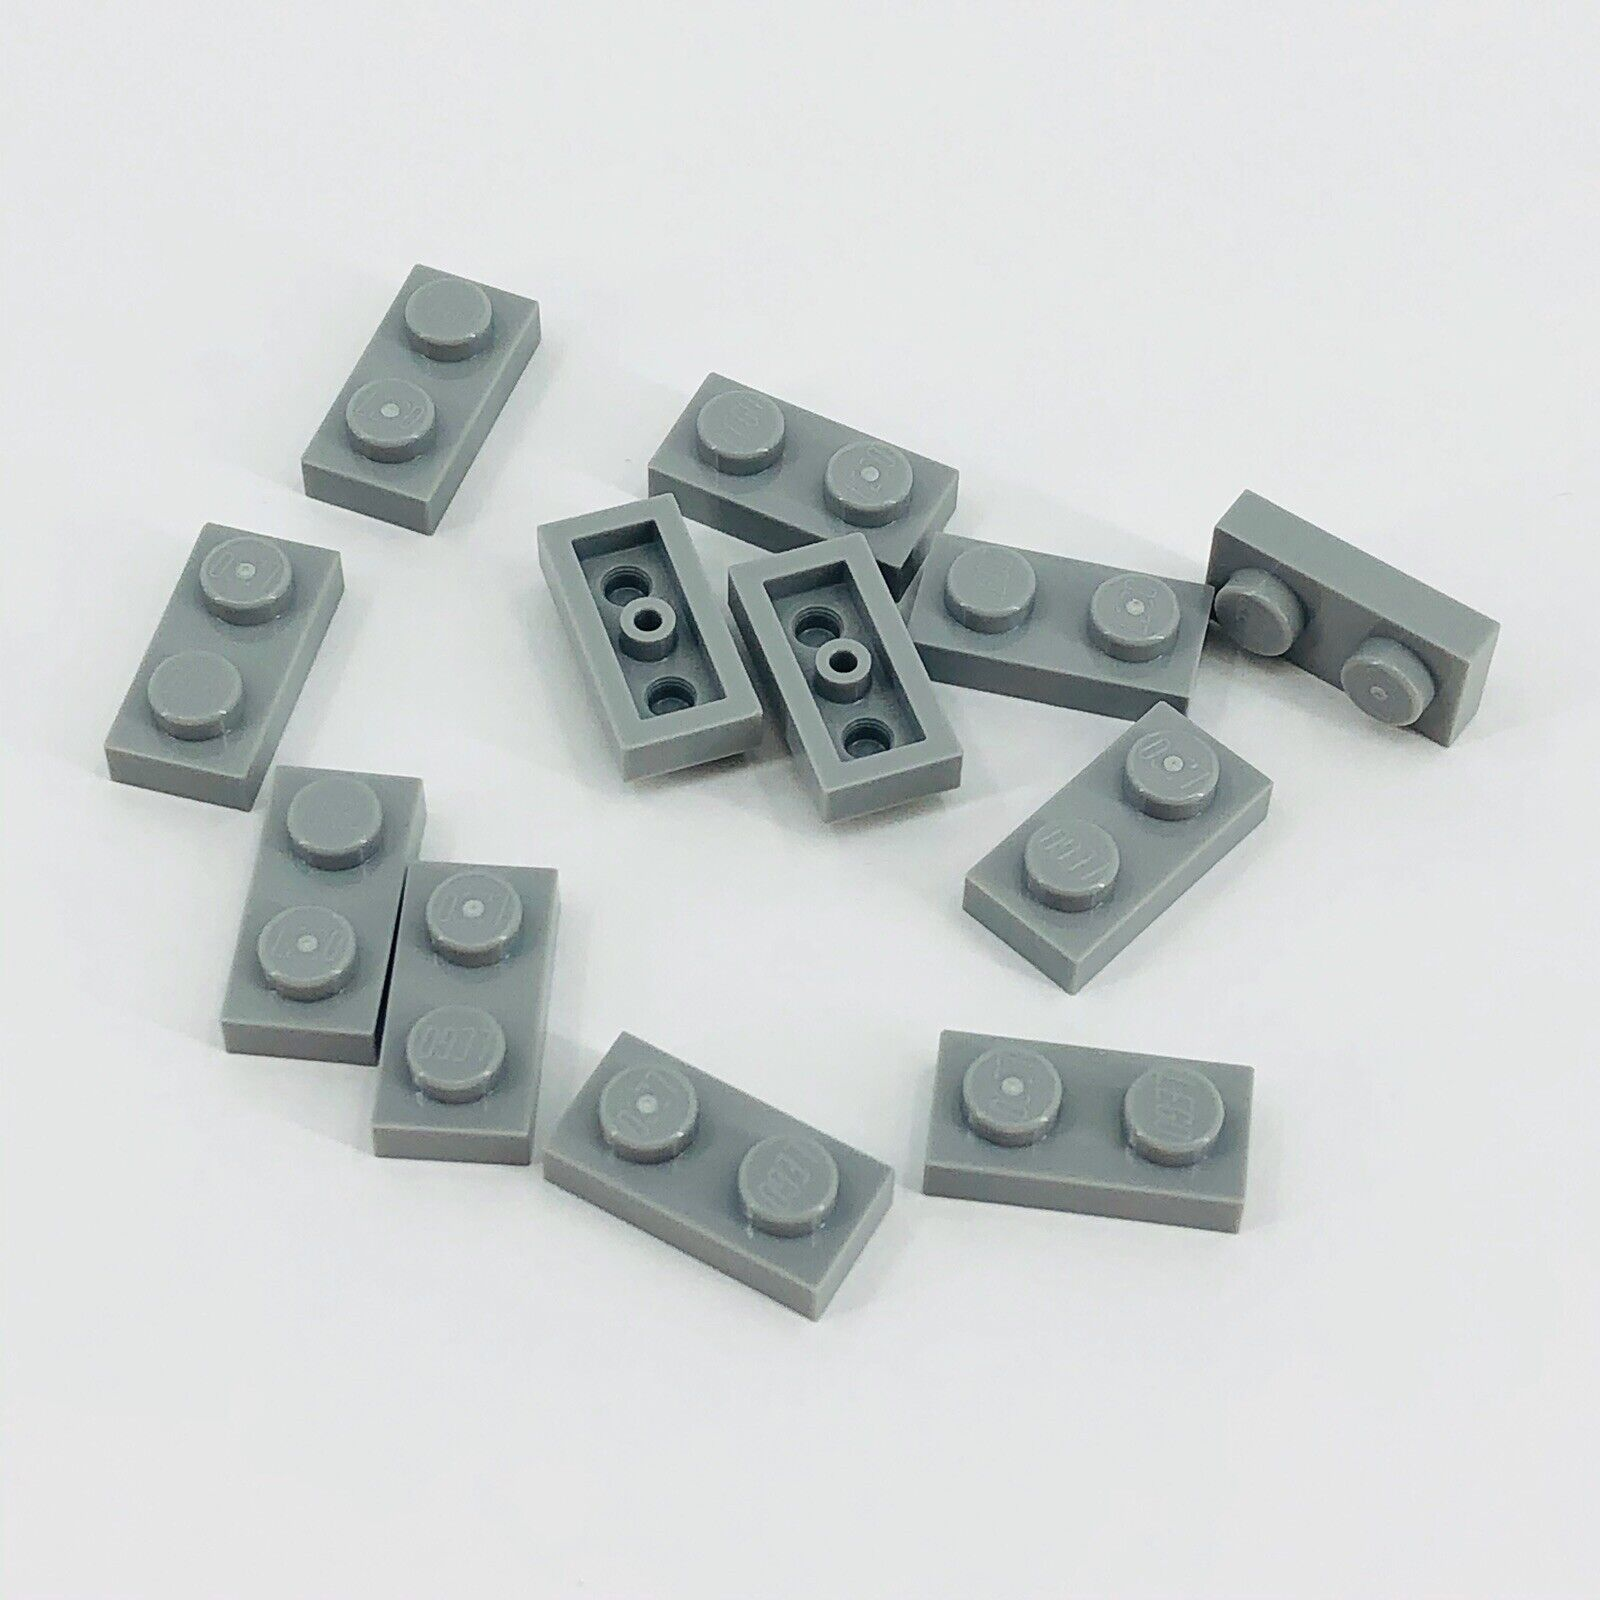 Lego 20 x placa 1x8 nuevo gris oscuro newdark Grey Gray Basic plate 3460 4210998